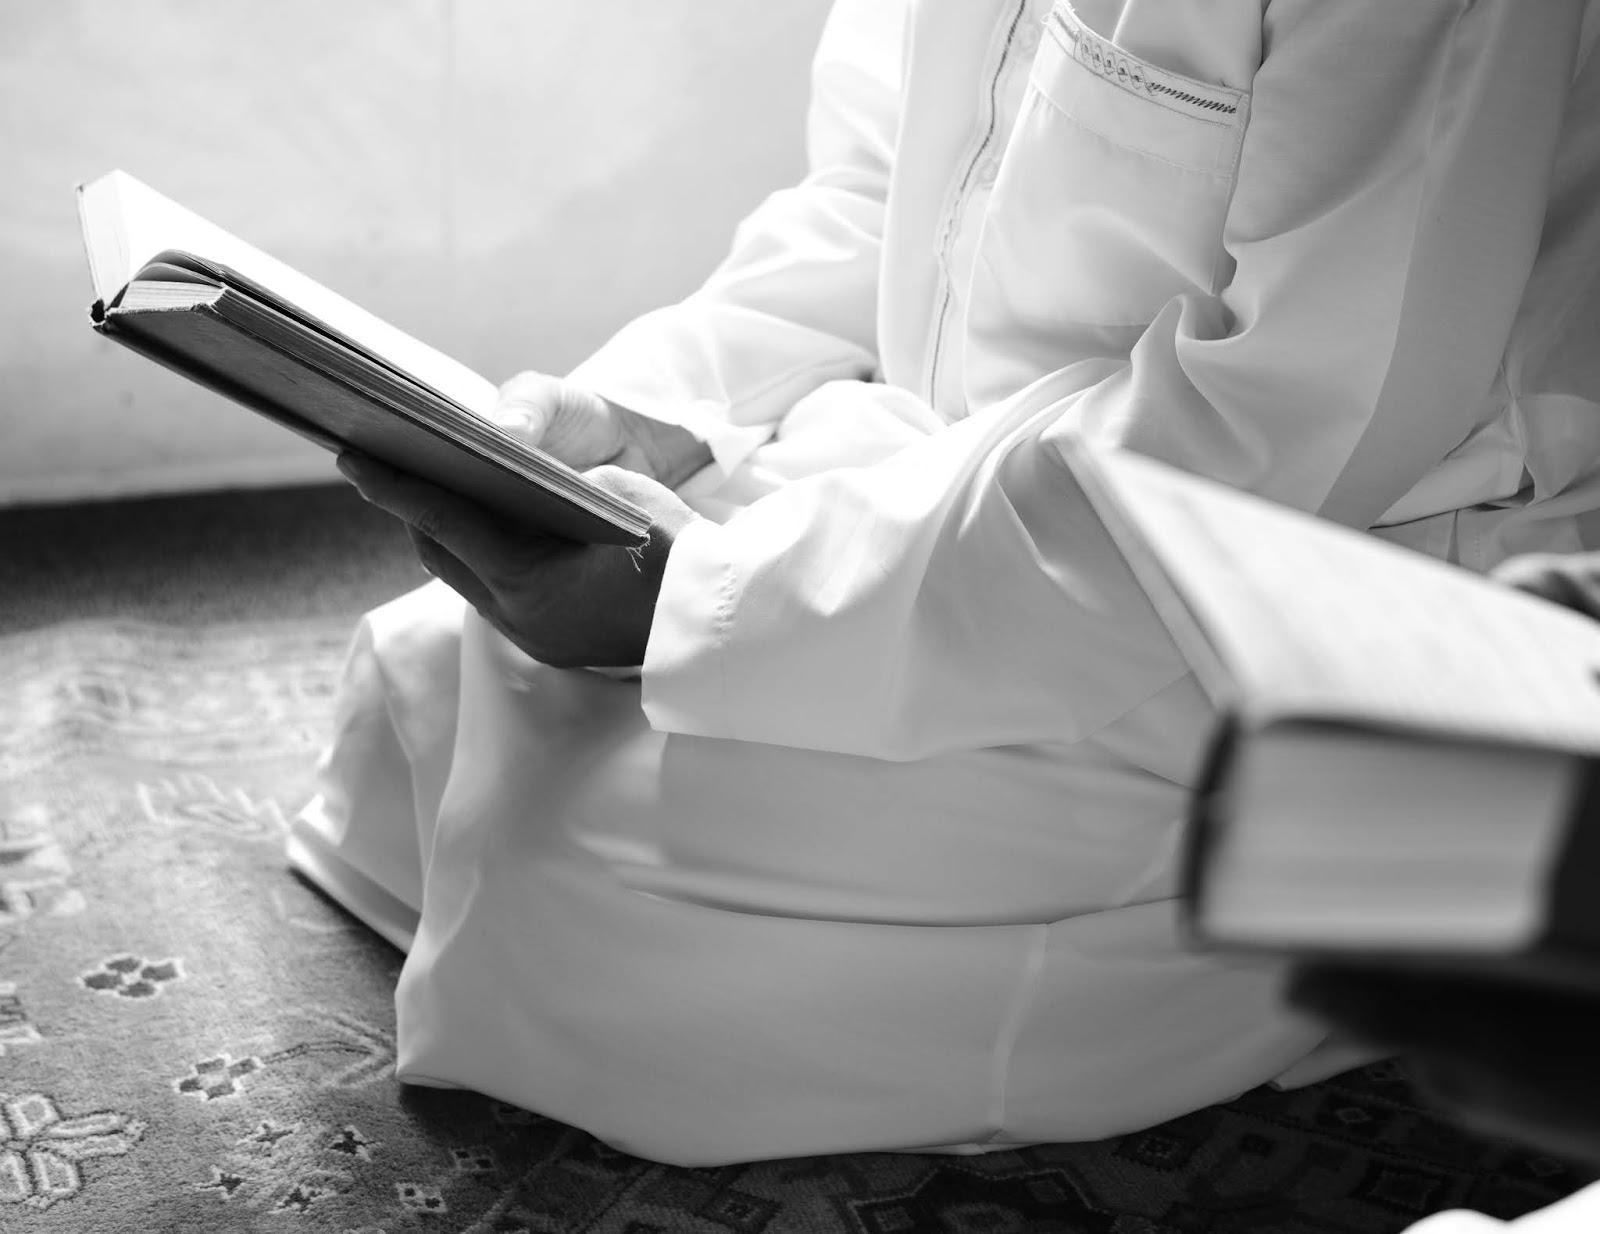 bangla islamic blog, ialamer alo, hadith, quran, islam, bangl, articale, dua, salat, shariah, islamic song, jihad